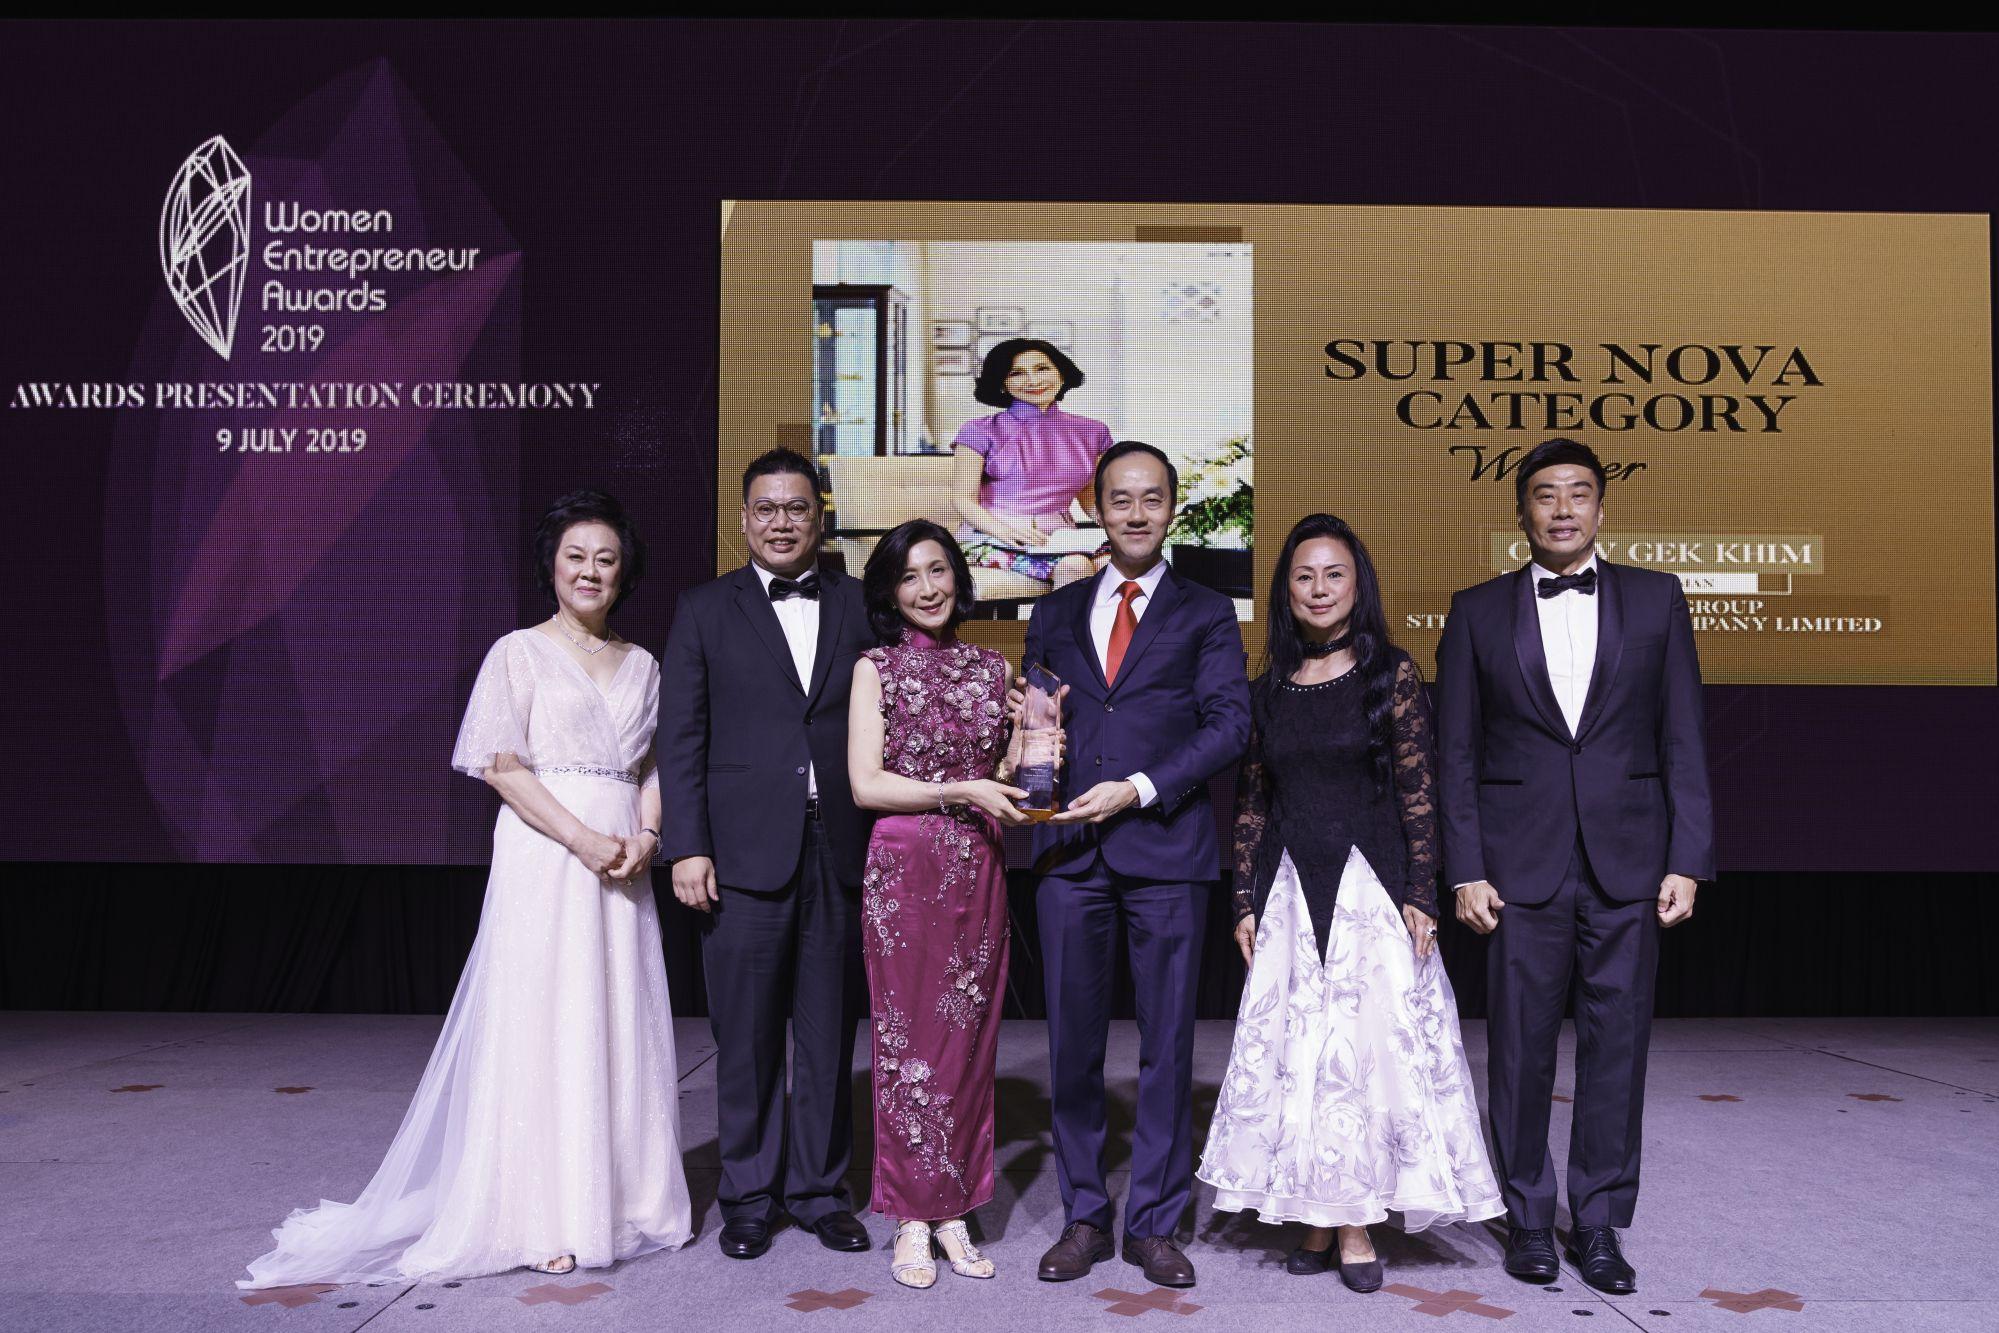 Dr Gan See Khem, Francis Leong, Chew Gek Khim, Dr Koh Poh Koon, Claire Chiang, Lennon Tan